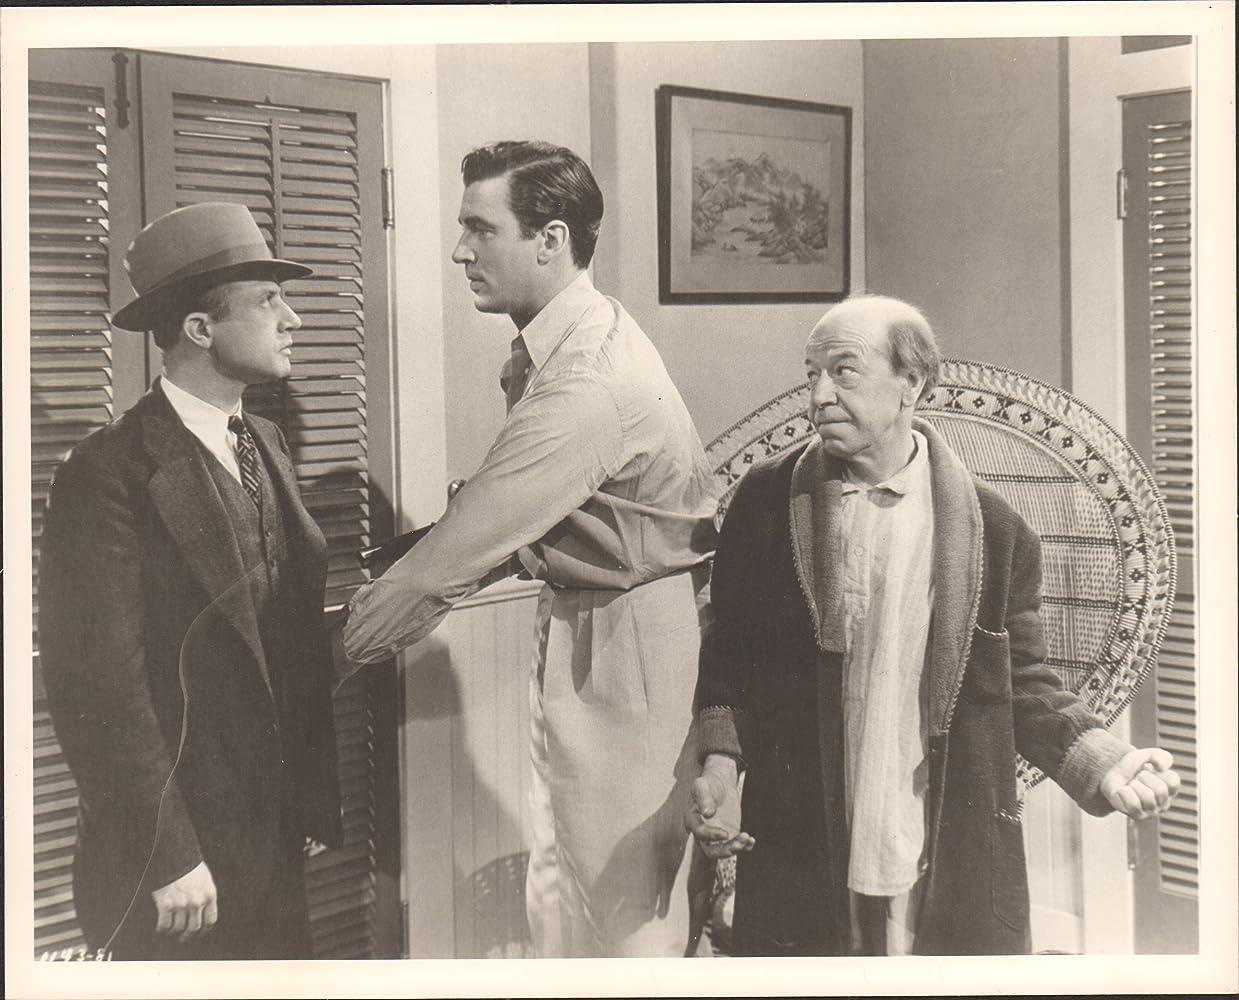 Dwight Frye, Donald Meek, and Walter Pidgeon in Phantom Raiders (1940)